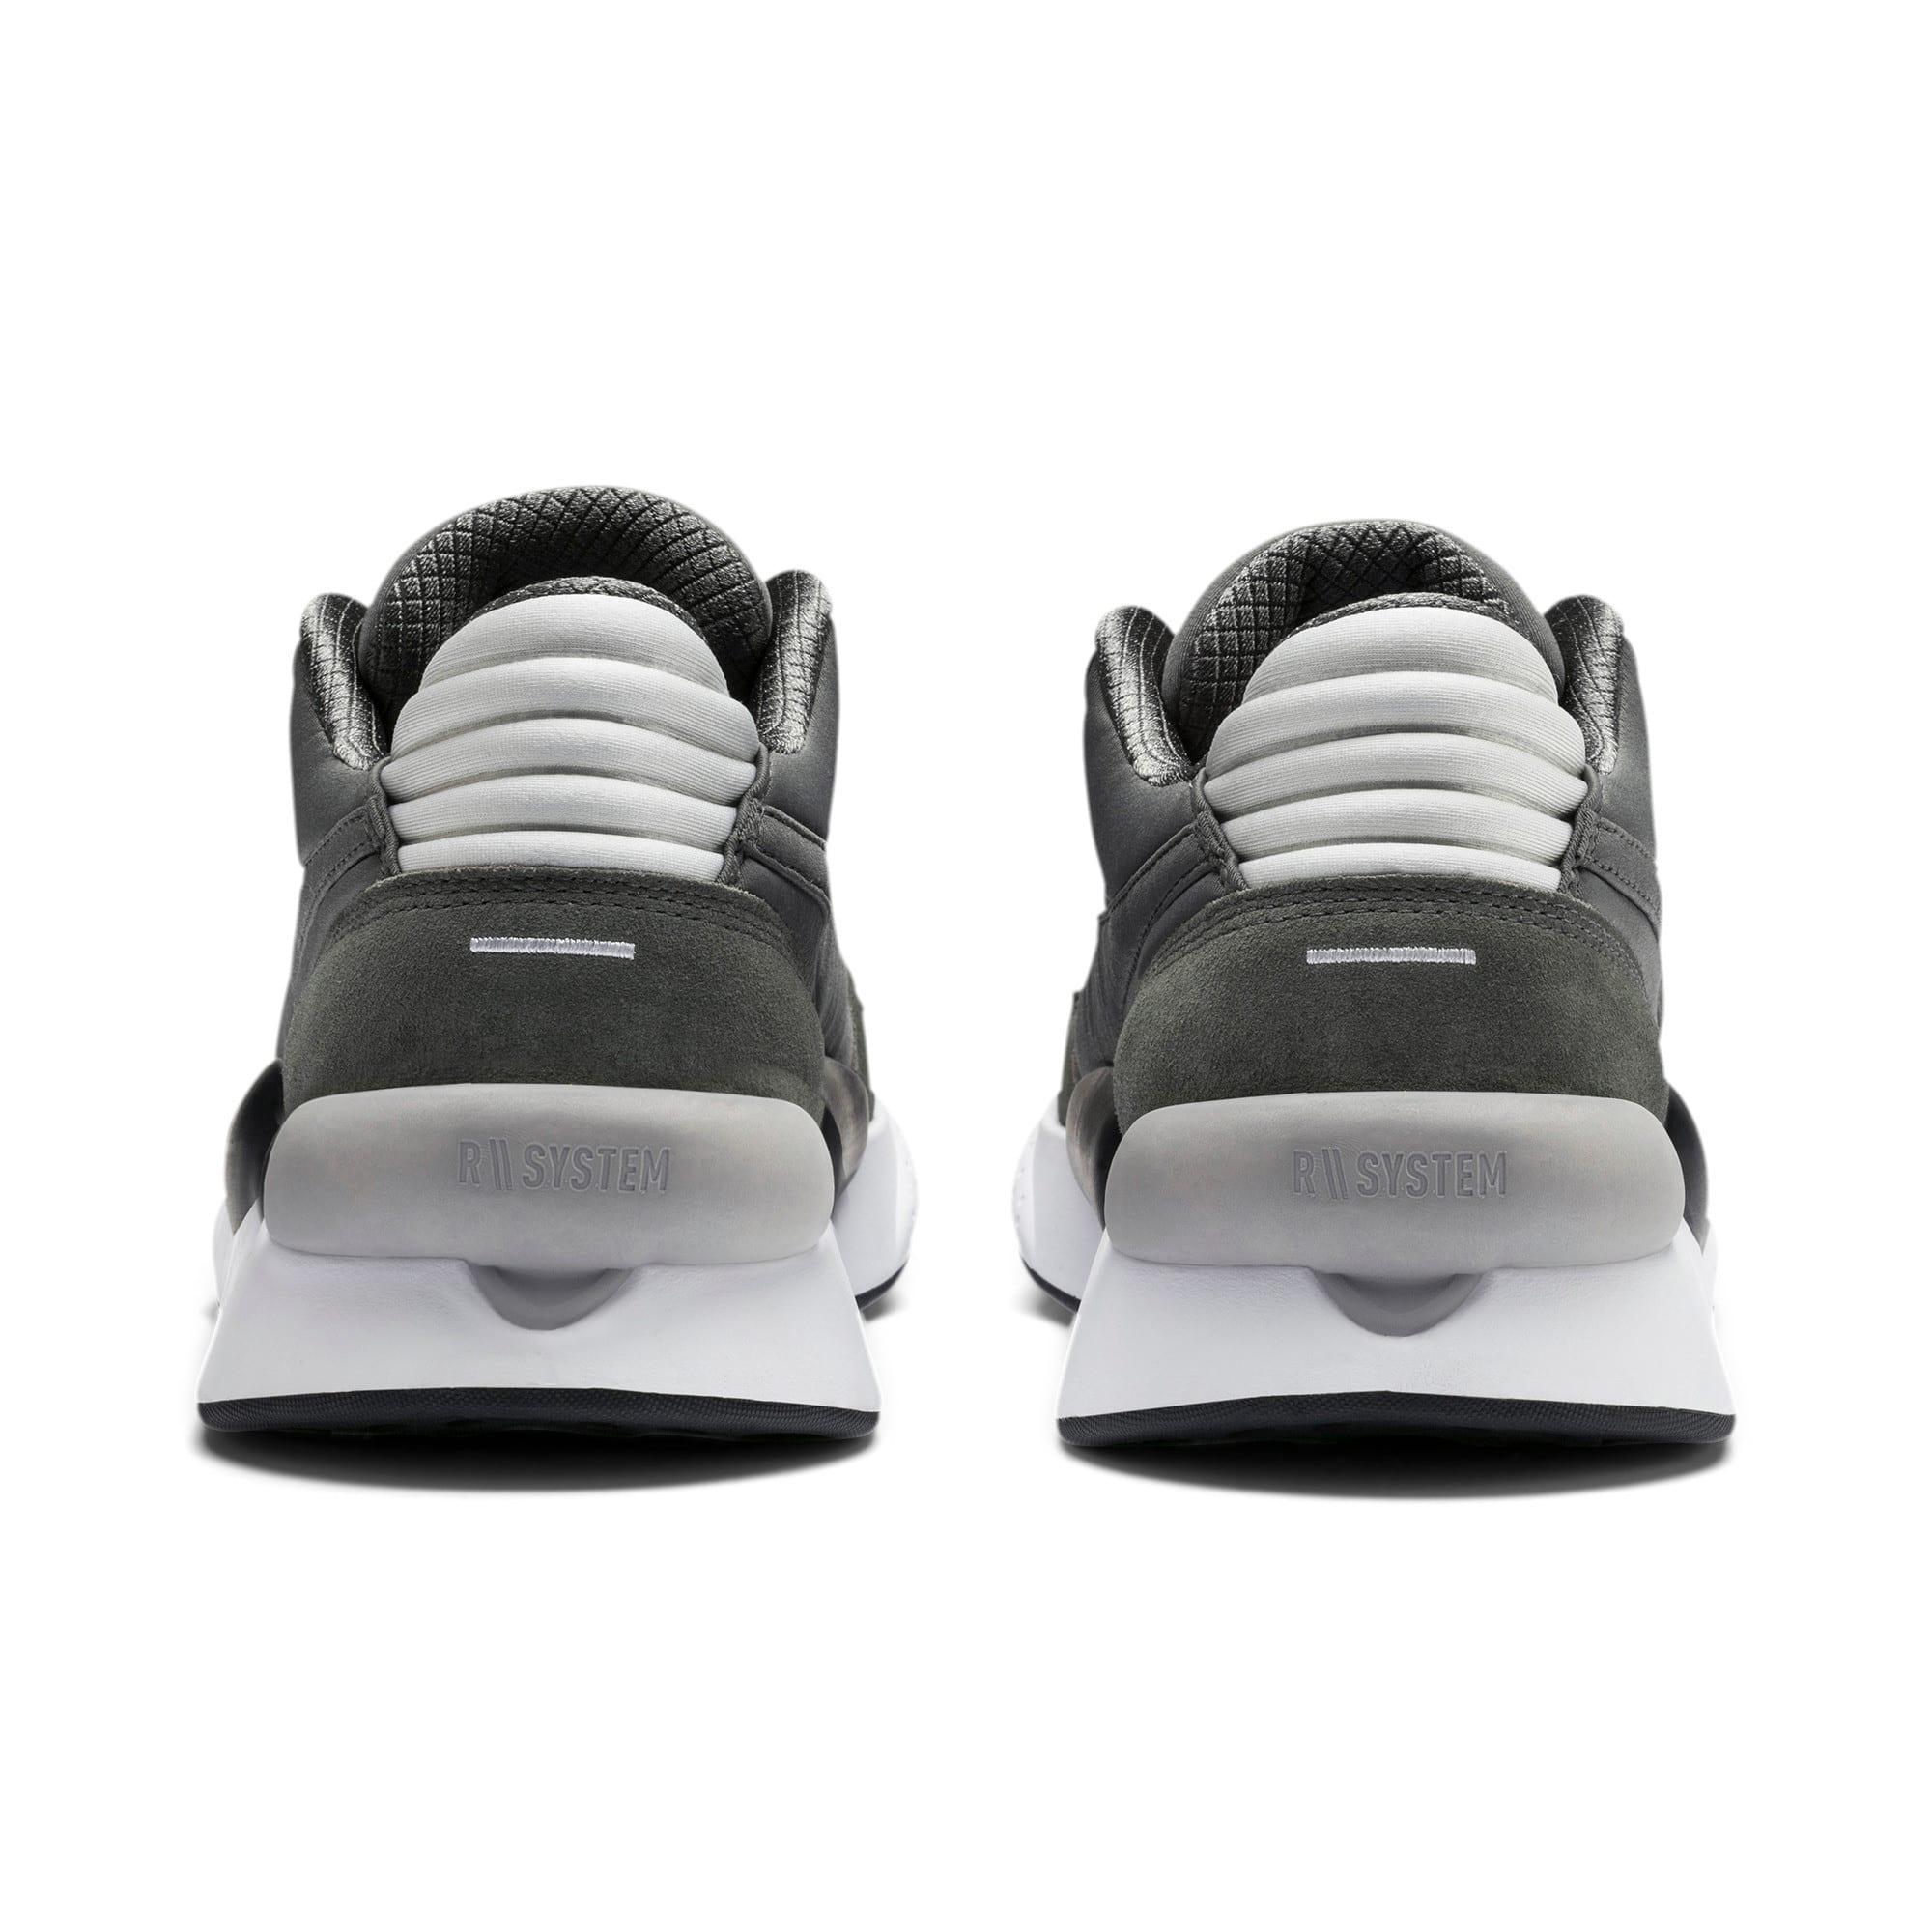 Thumbnail 3 of RS 9.8 Gravity Sneakers, CASTLEROCK-Puma Black, medium